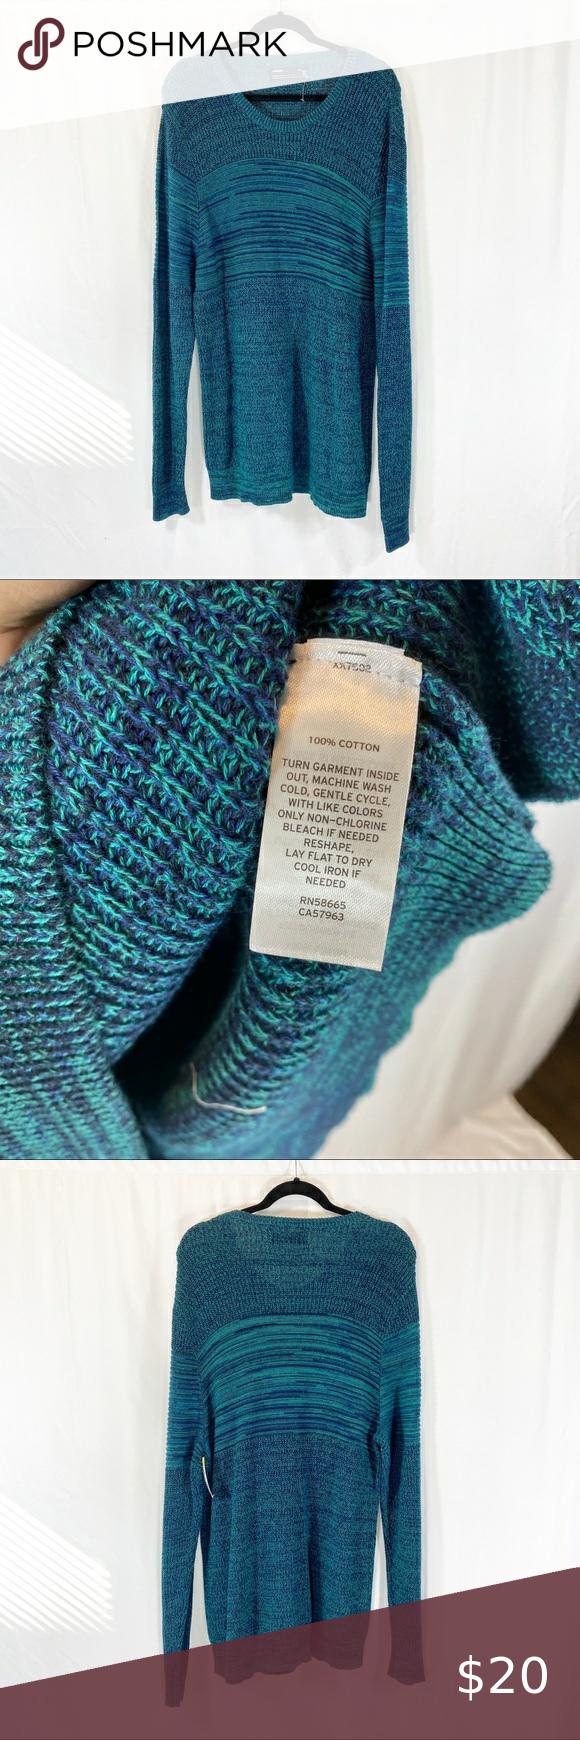 Sale 3 35 Public Opinion Multi Stich Sweater Sale 3 35 Public Opinion Green Multi Stich Sweater Size Large N Clothes Design Fashion Trends Sweater Sale